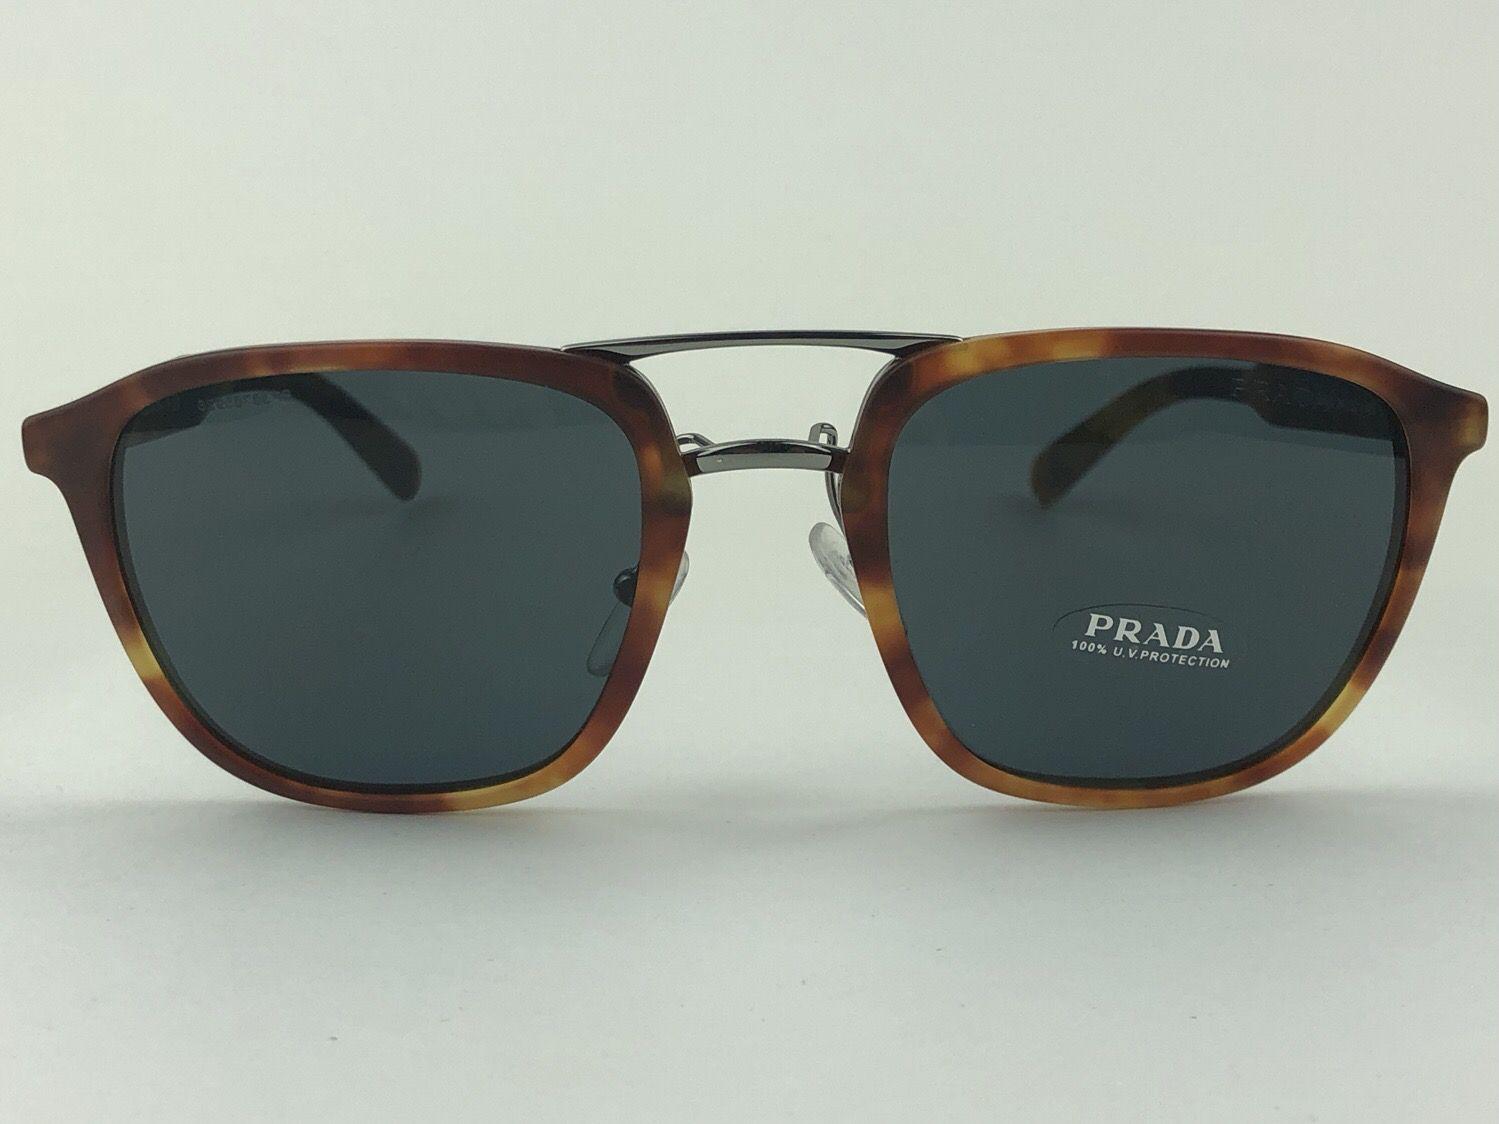 d9e1461e1 Prada - PR12TS - Havana - HAJ-2K1- 54/22 - Óculos de sol - Otica La ...